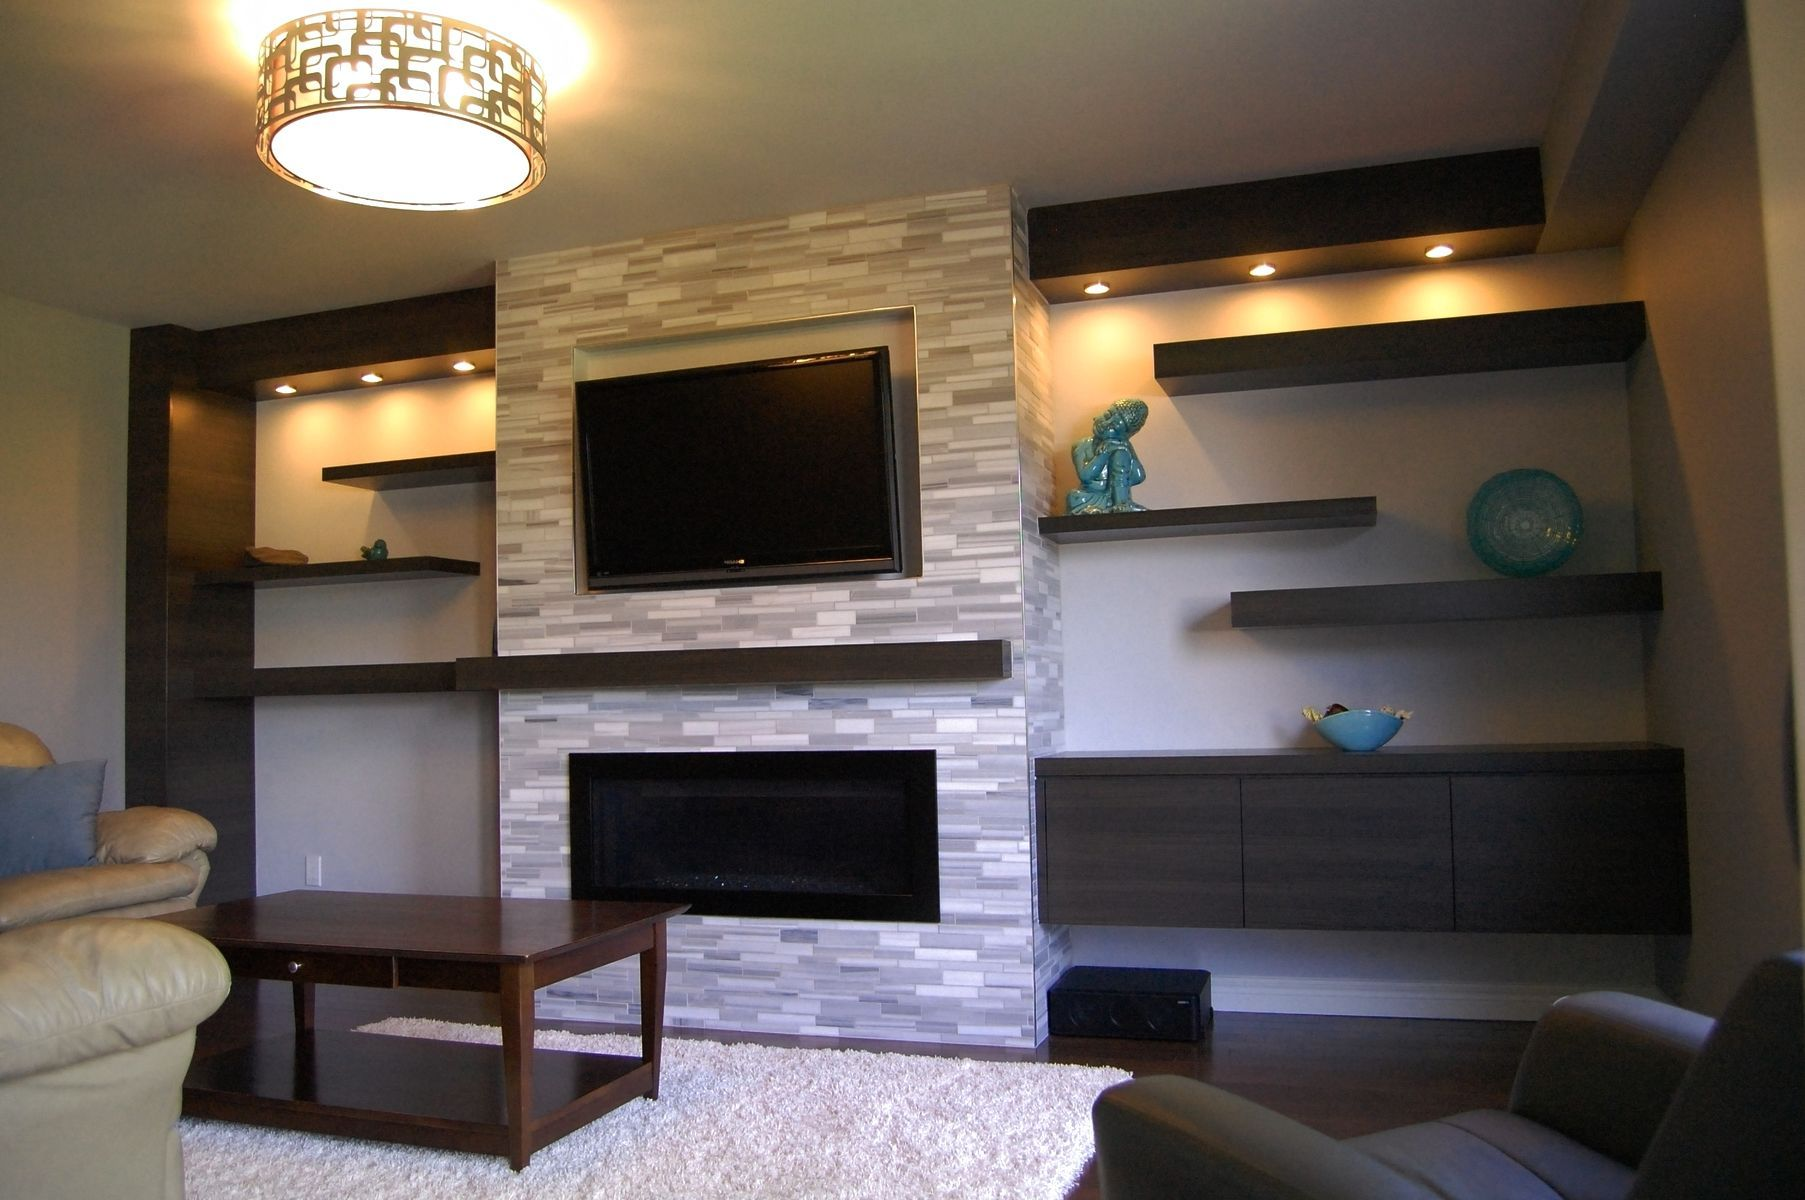 Elegant Design Tv Fireplace Ideas | Wall mounted fireplace ...